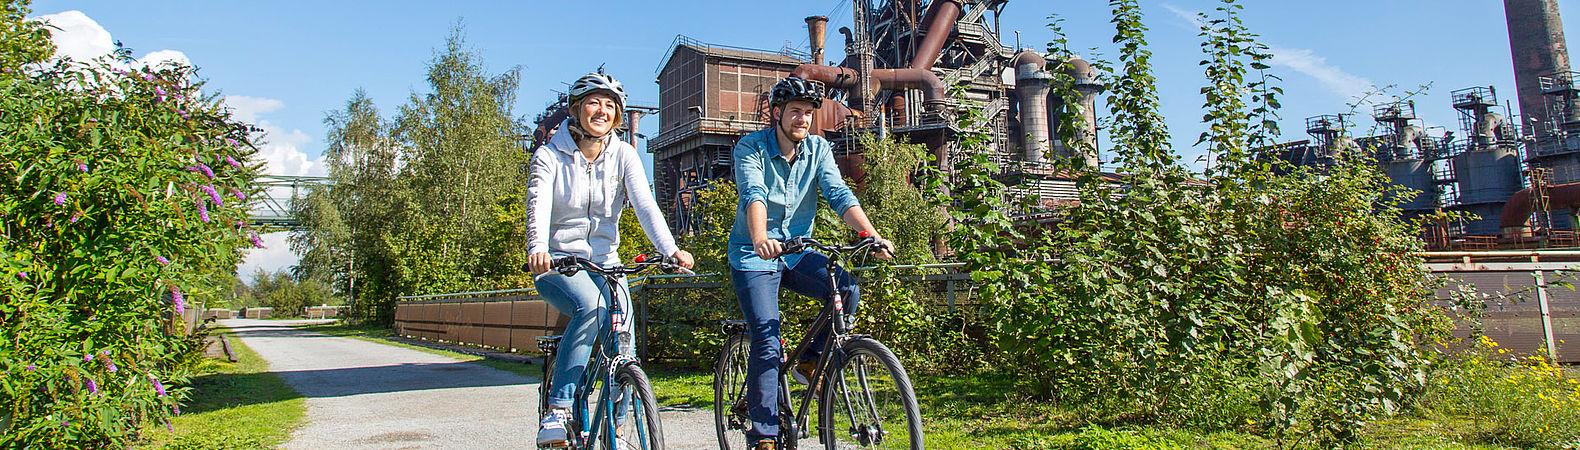 Route der Industriekultur per Rad, © Jochen Tack